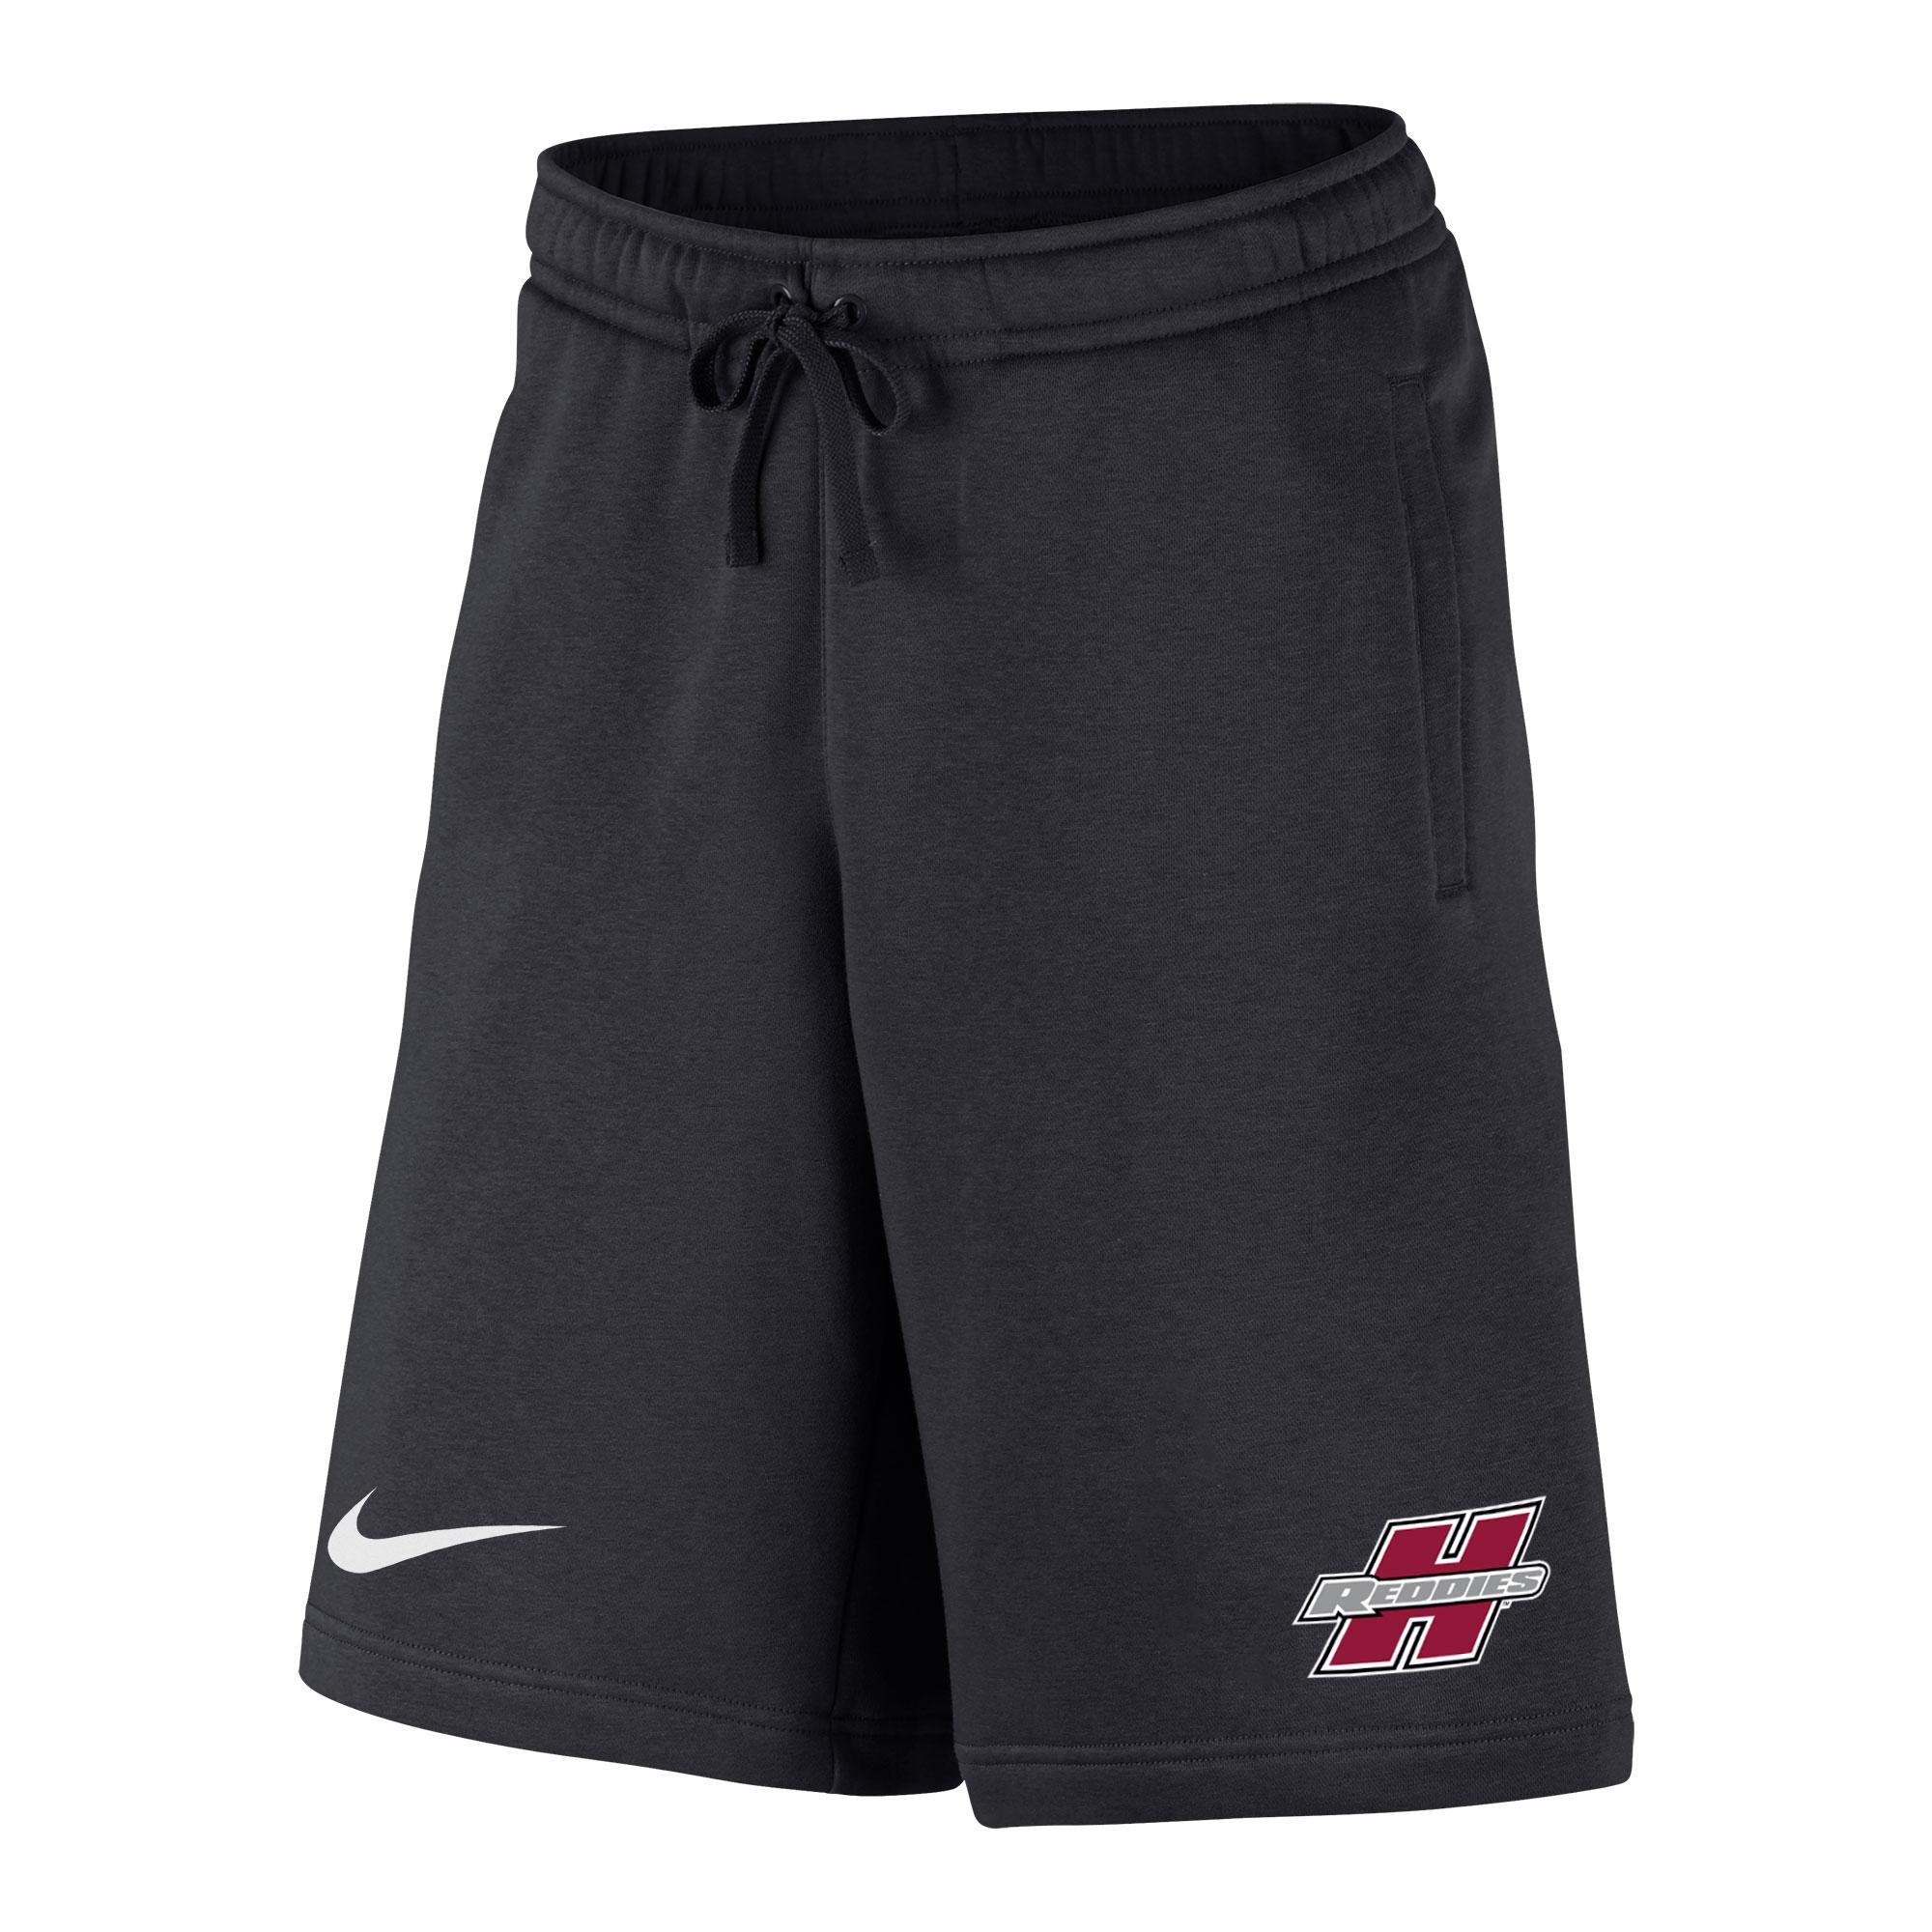 Henderson Reddies Nike Men's Club Fleece Short